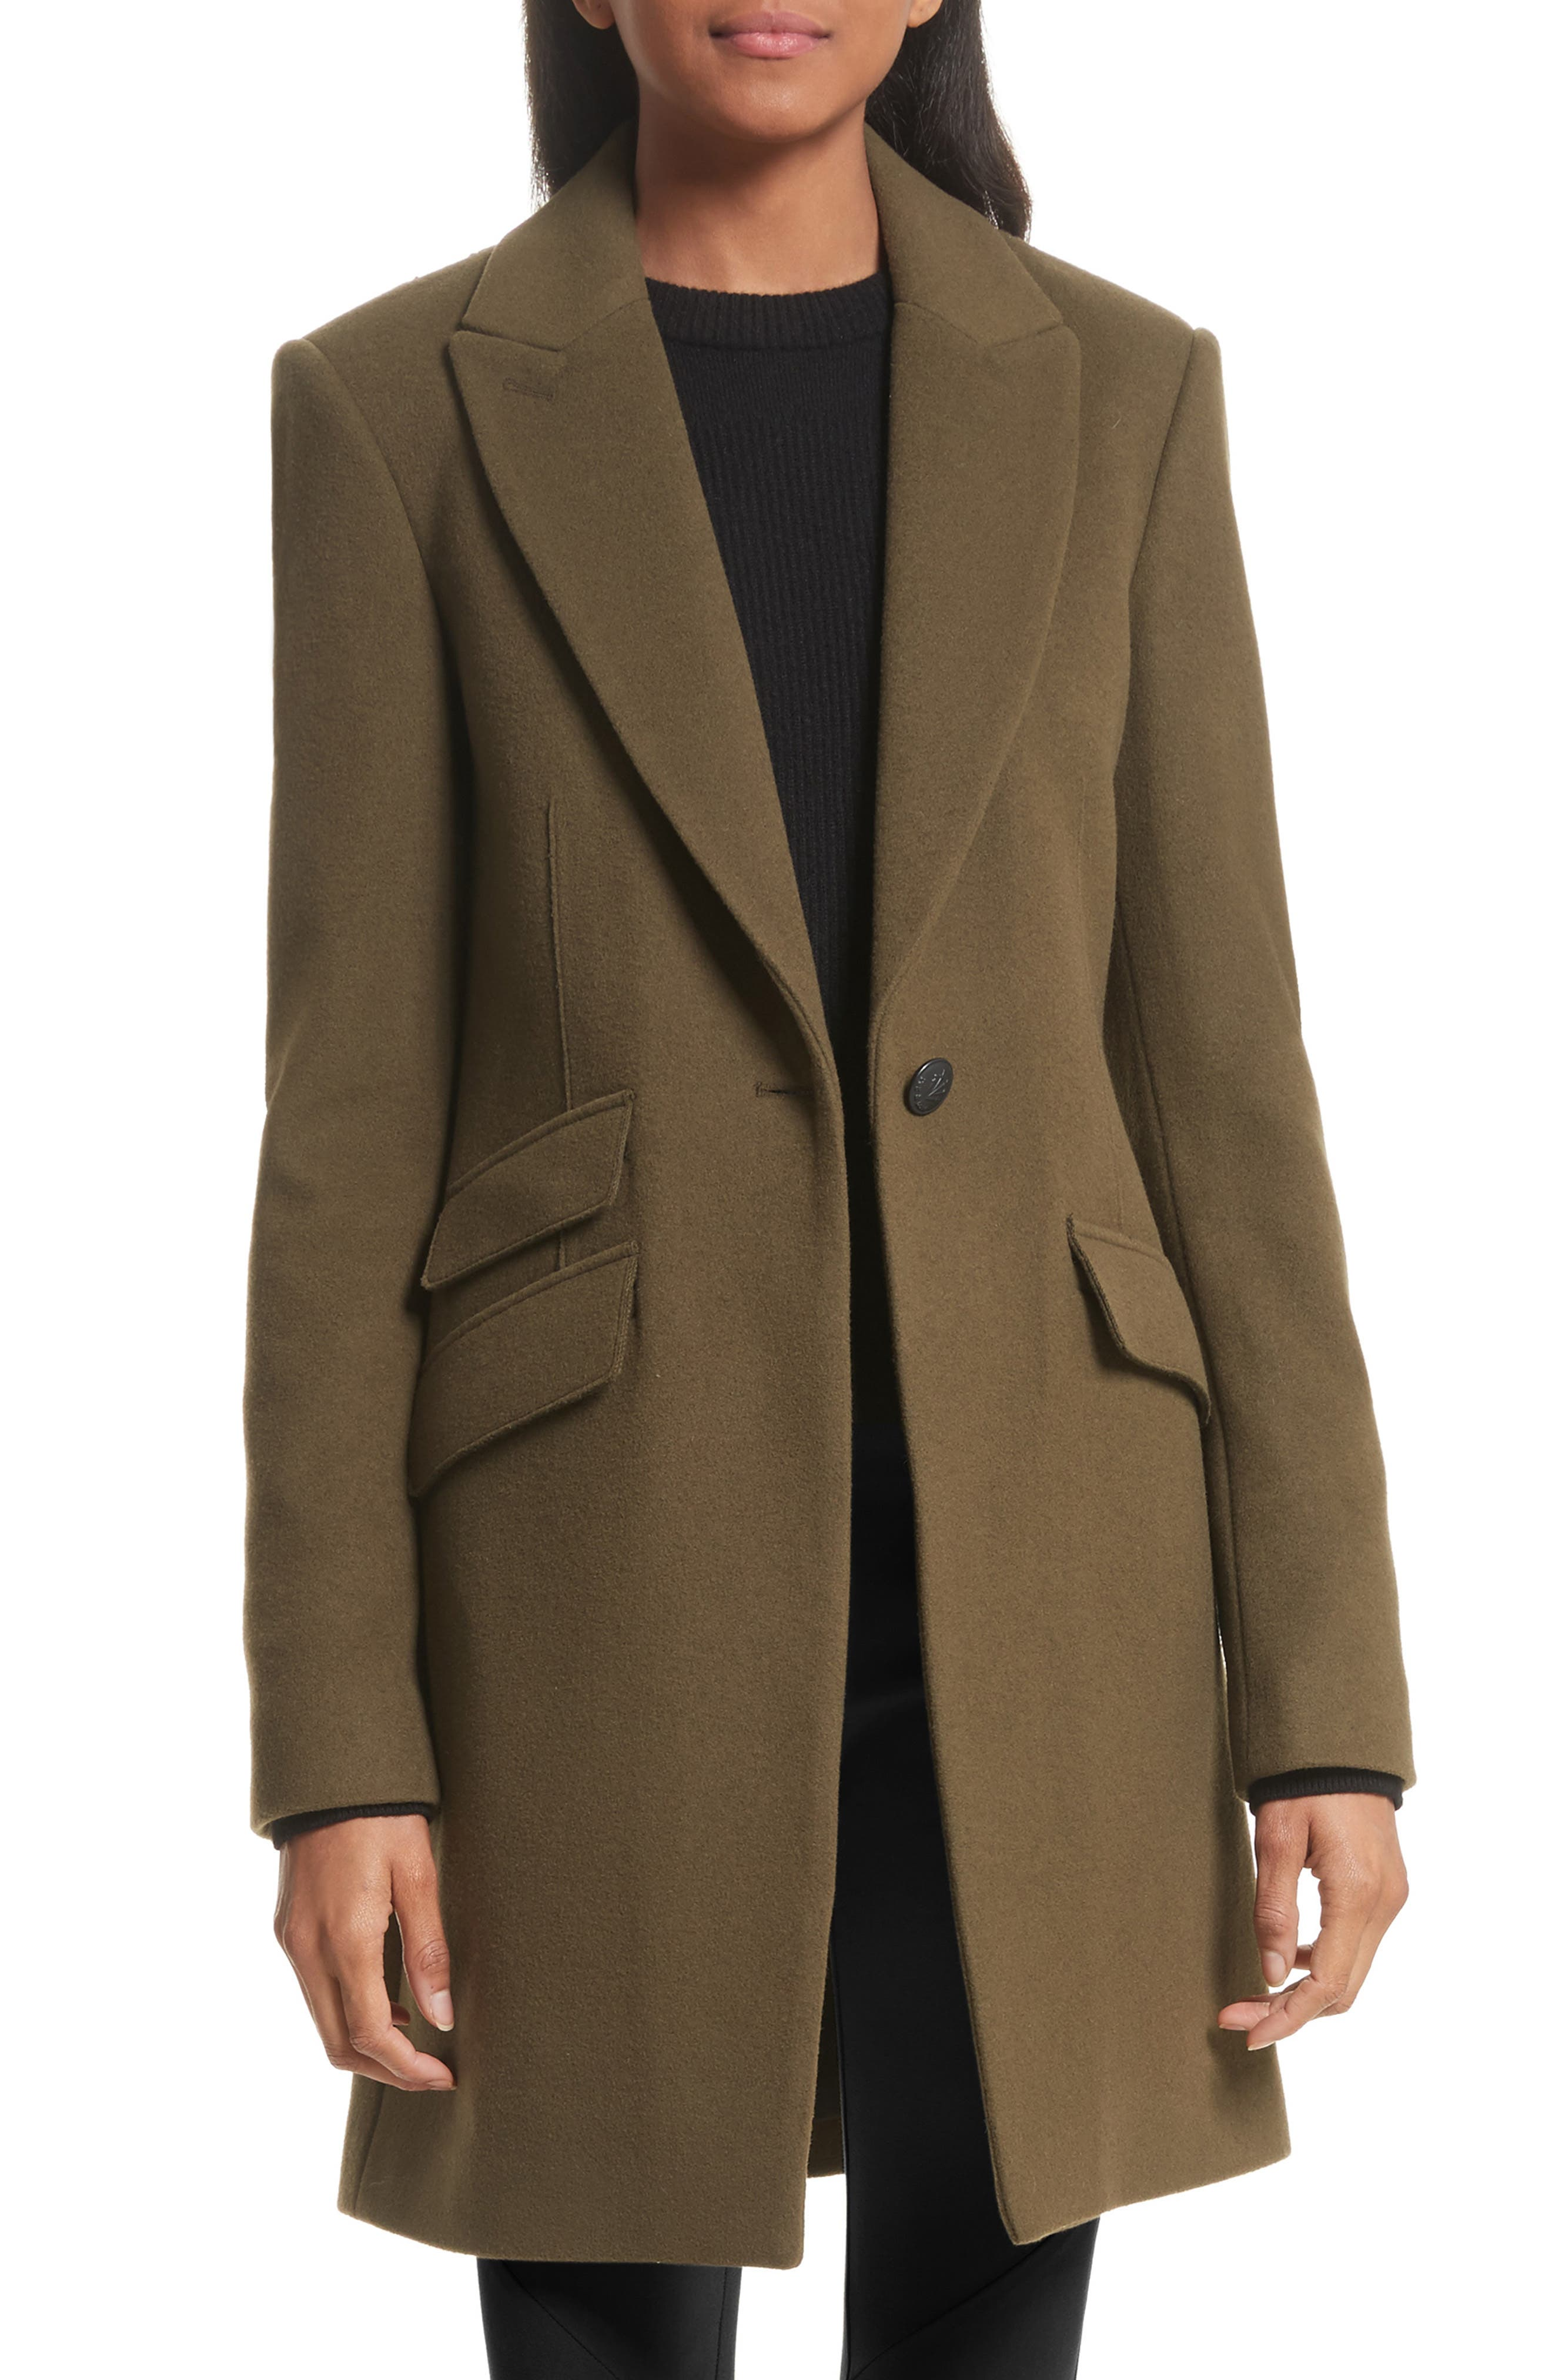 Duchess Wool Blend Coat,                             Main thumbnail 1, color,                             325